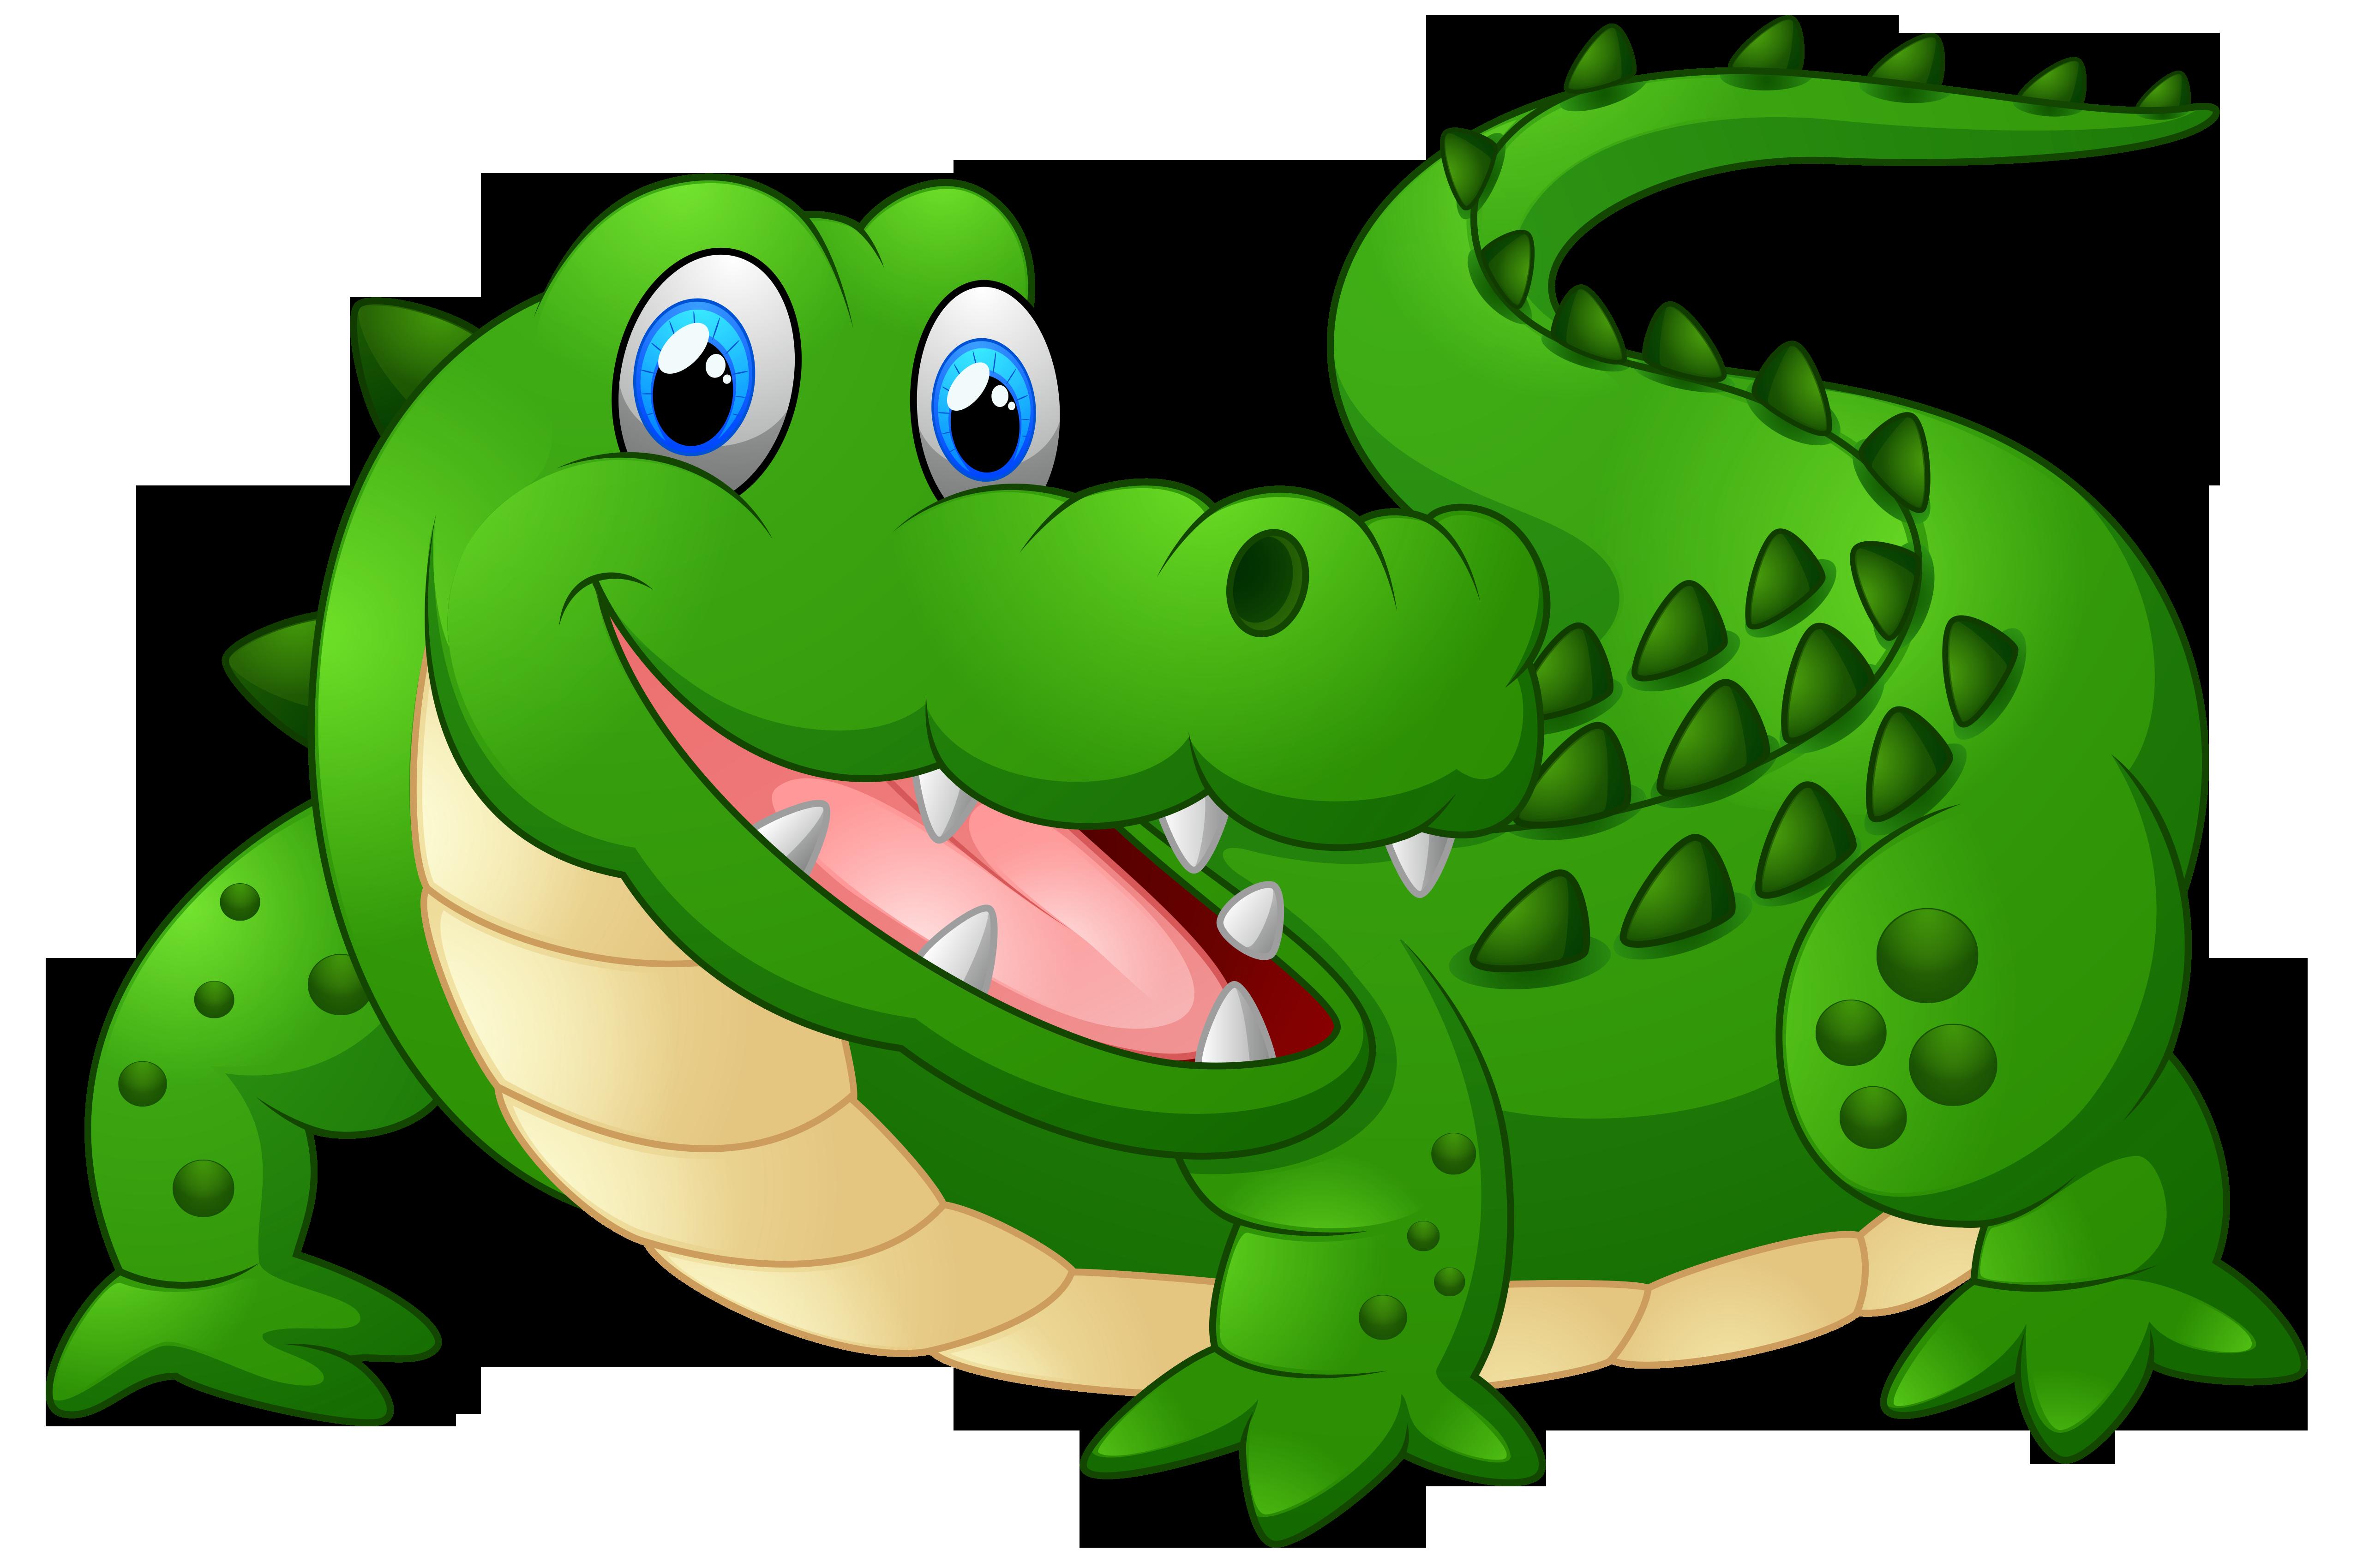 Foot clipart alligator, Foot alligator Transparent FREE for.